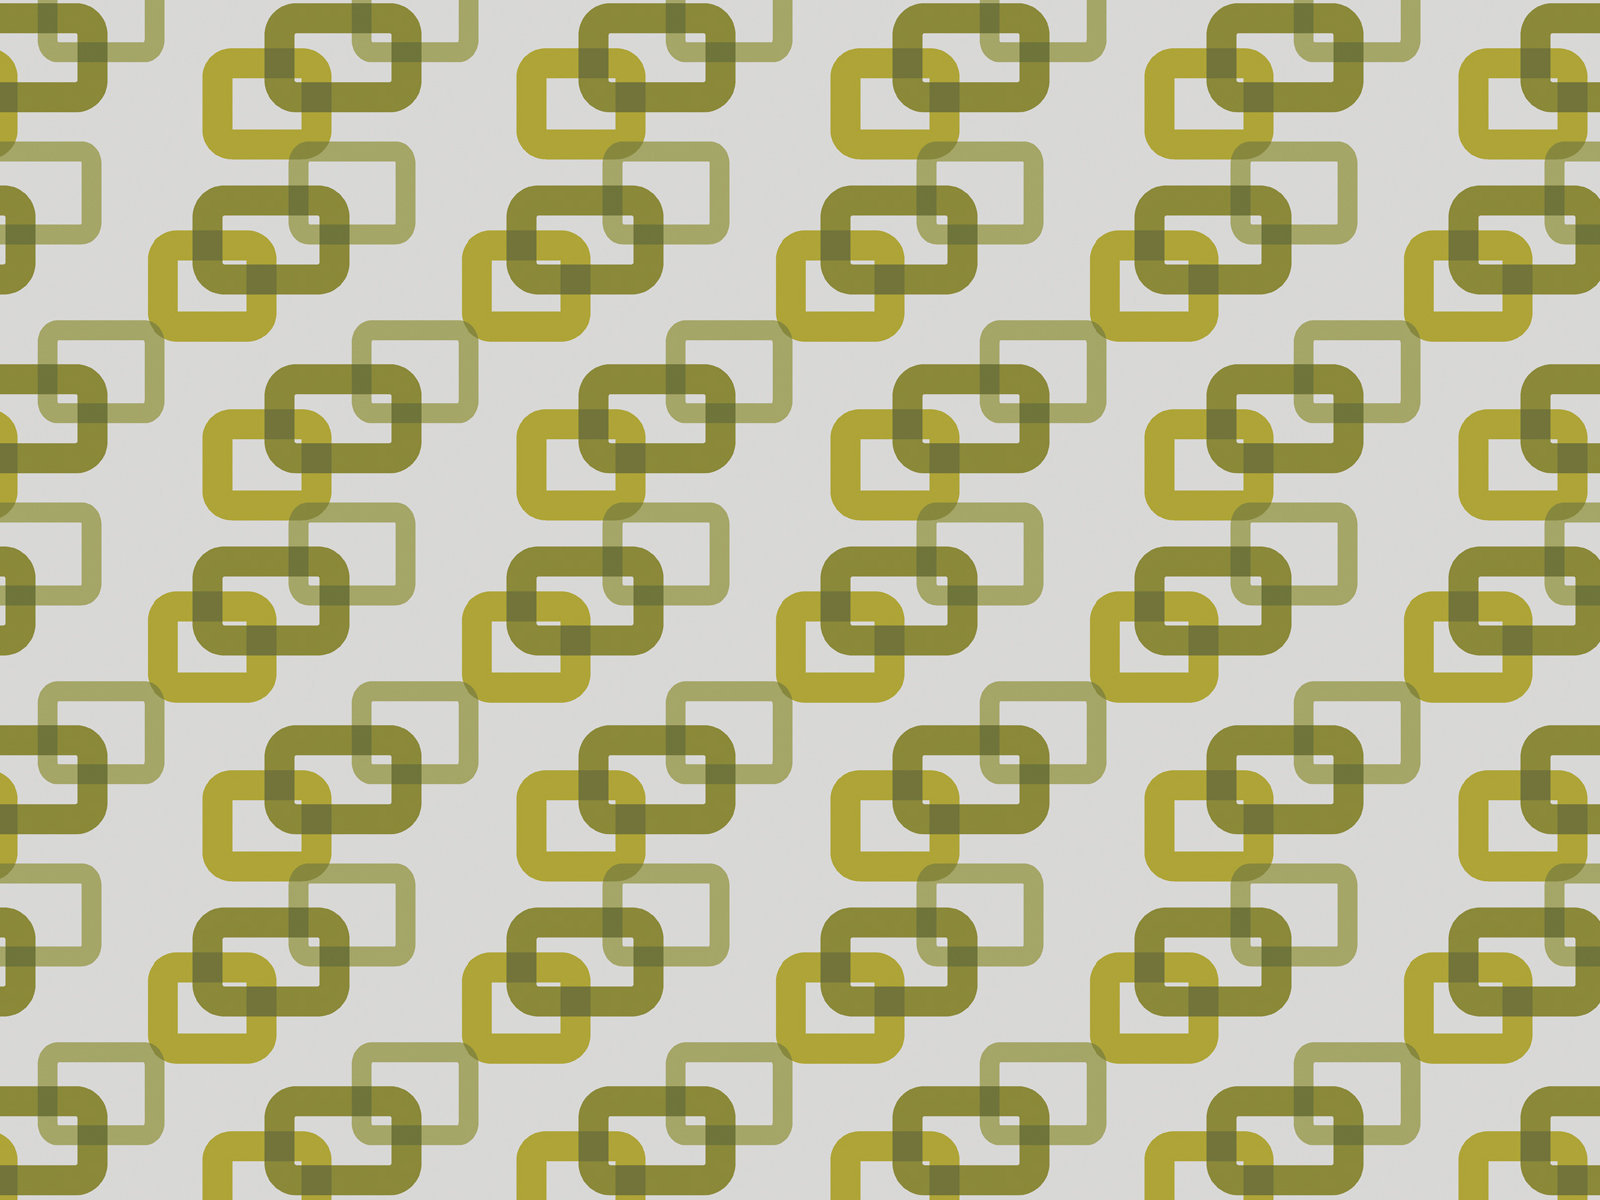 Pin Wallpaper 19...1970s Wallpaper Green Leaves